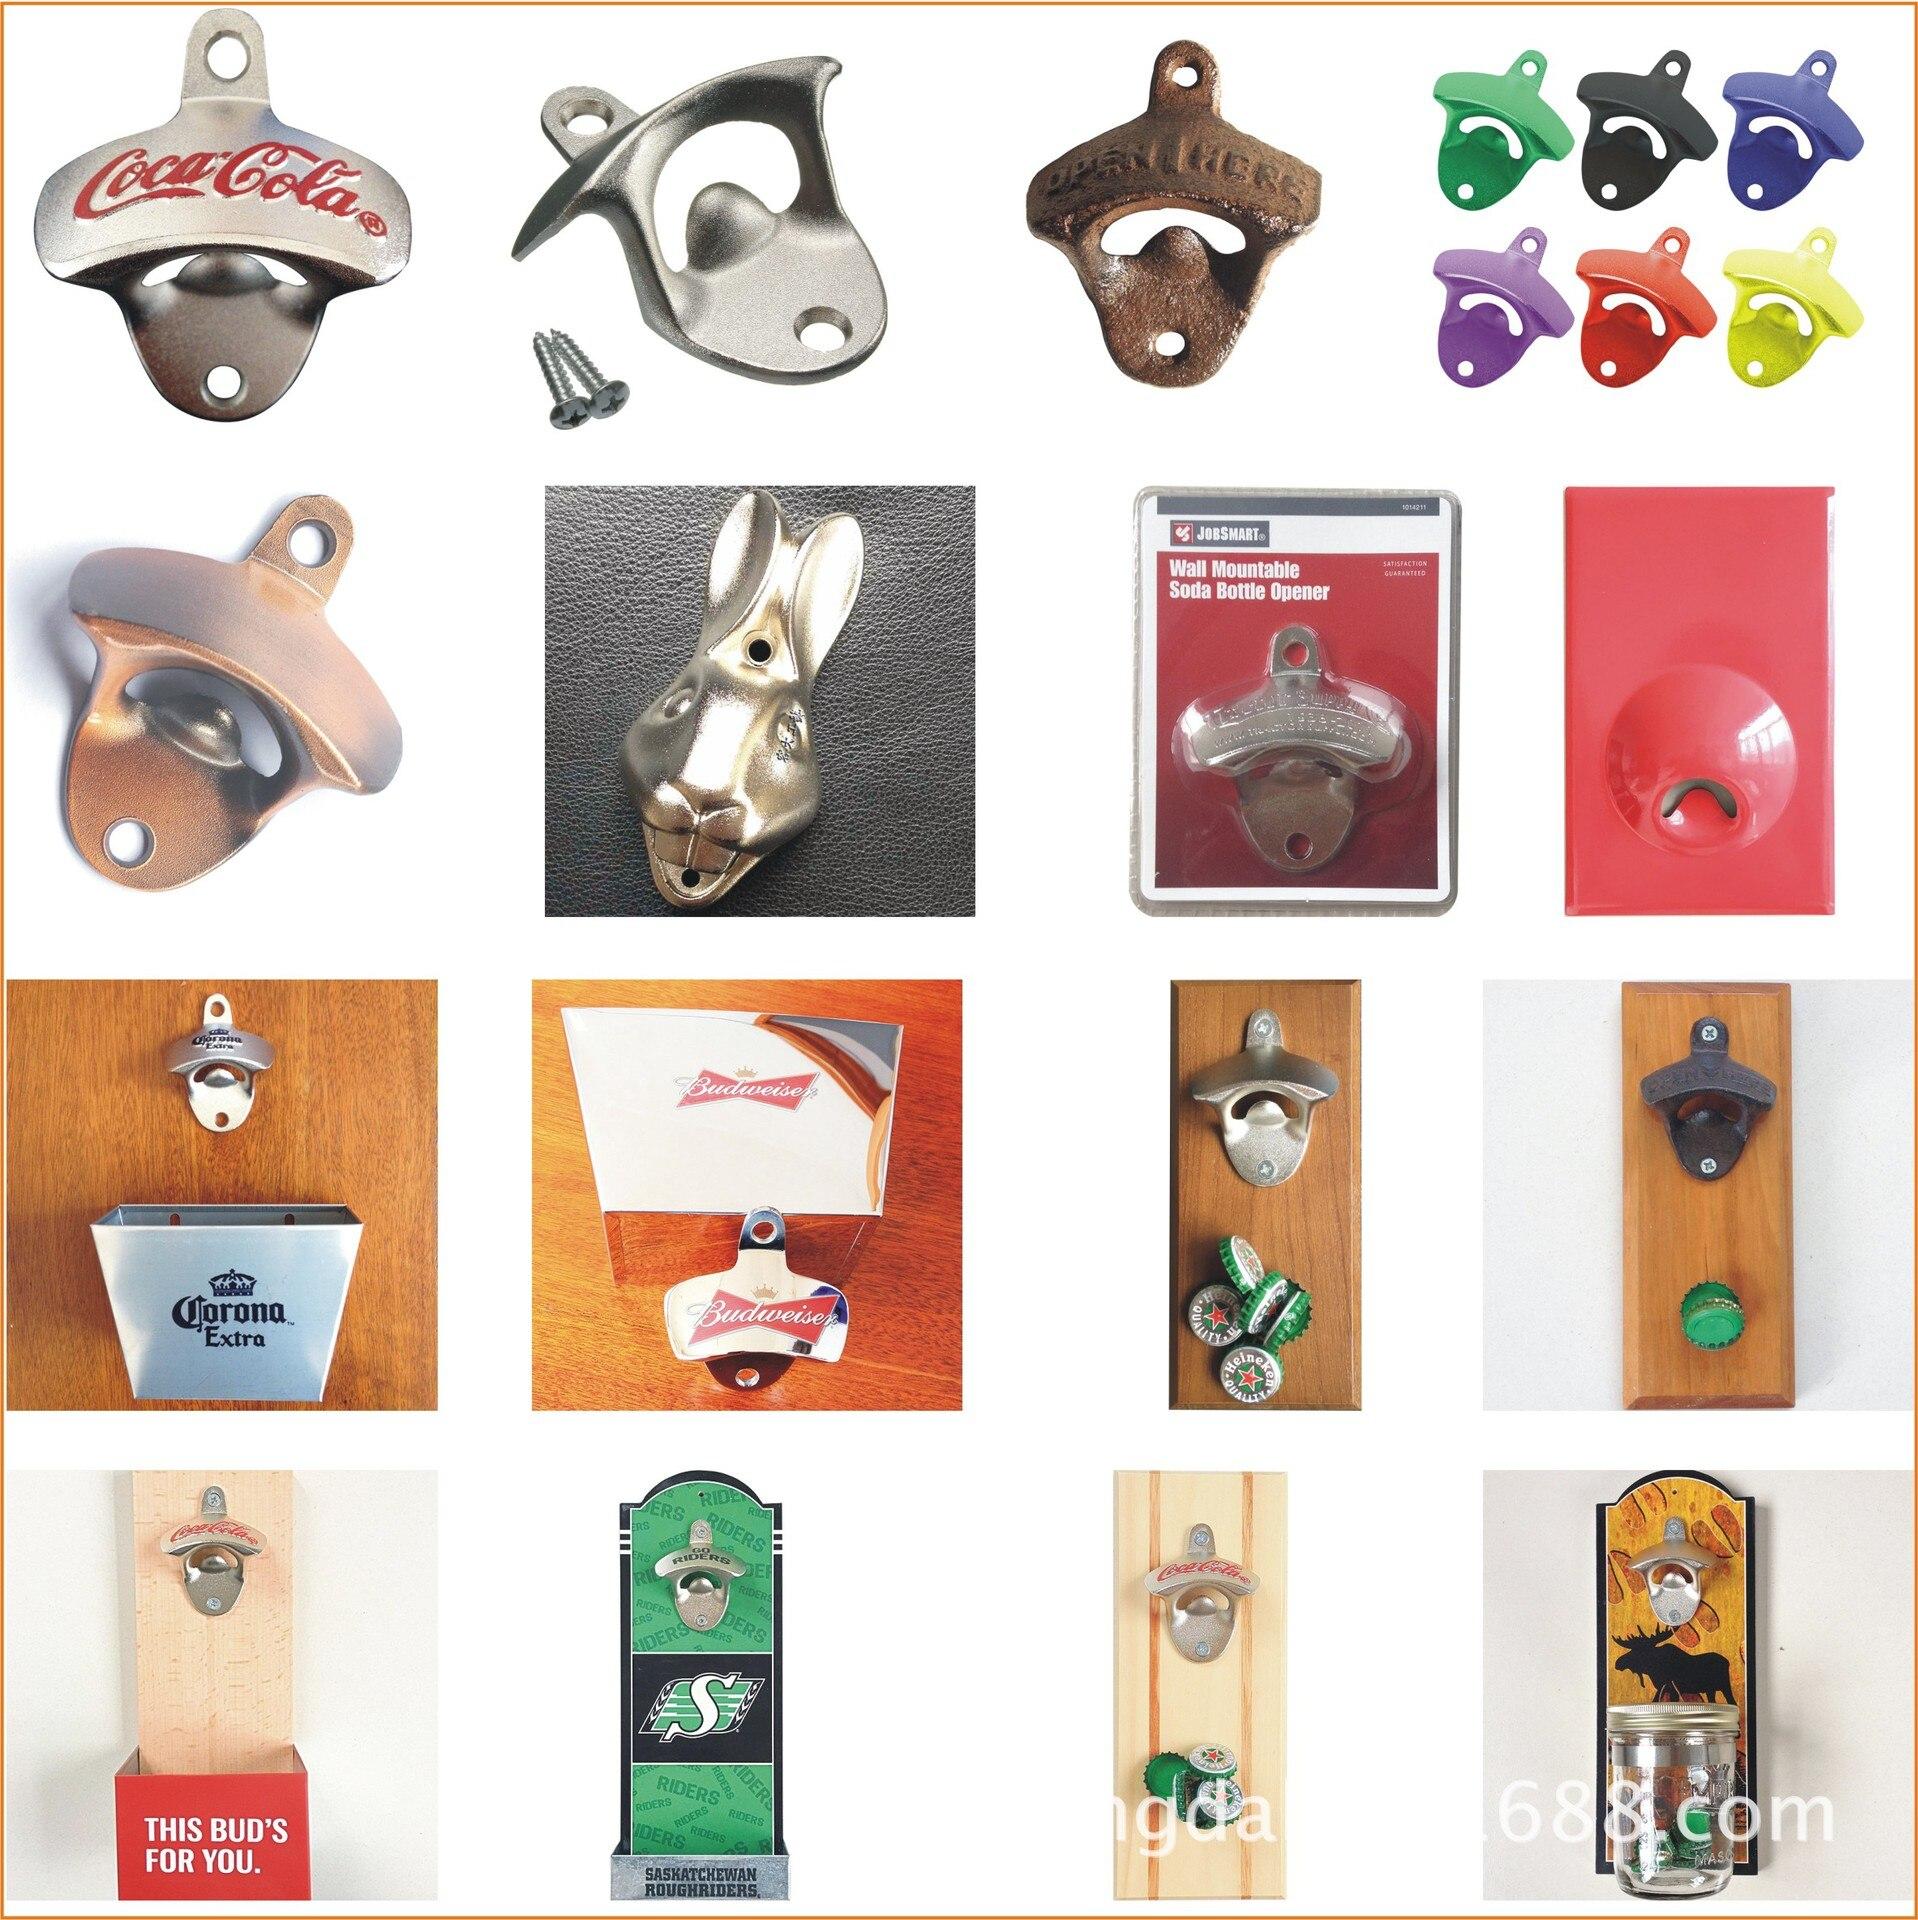 Kitchenware Board Refridgerator Magnets Bottle Opener Advertising Beer Leaves Wall Hanging Zinc Alloy Fixed Bottle Opener